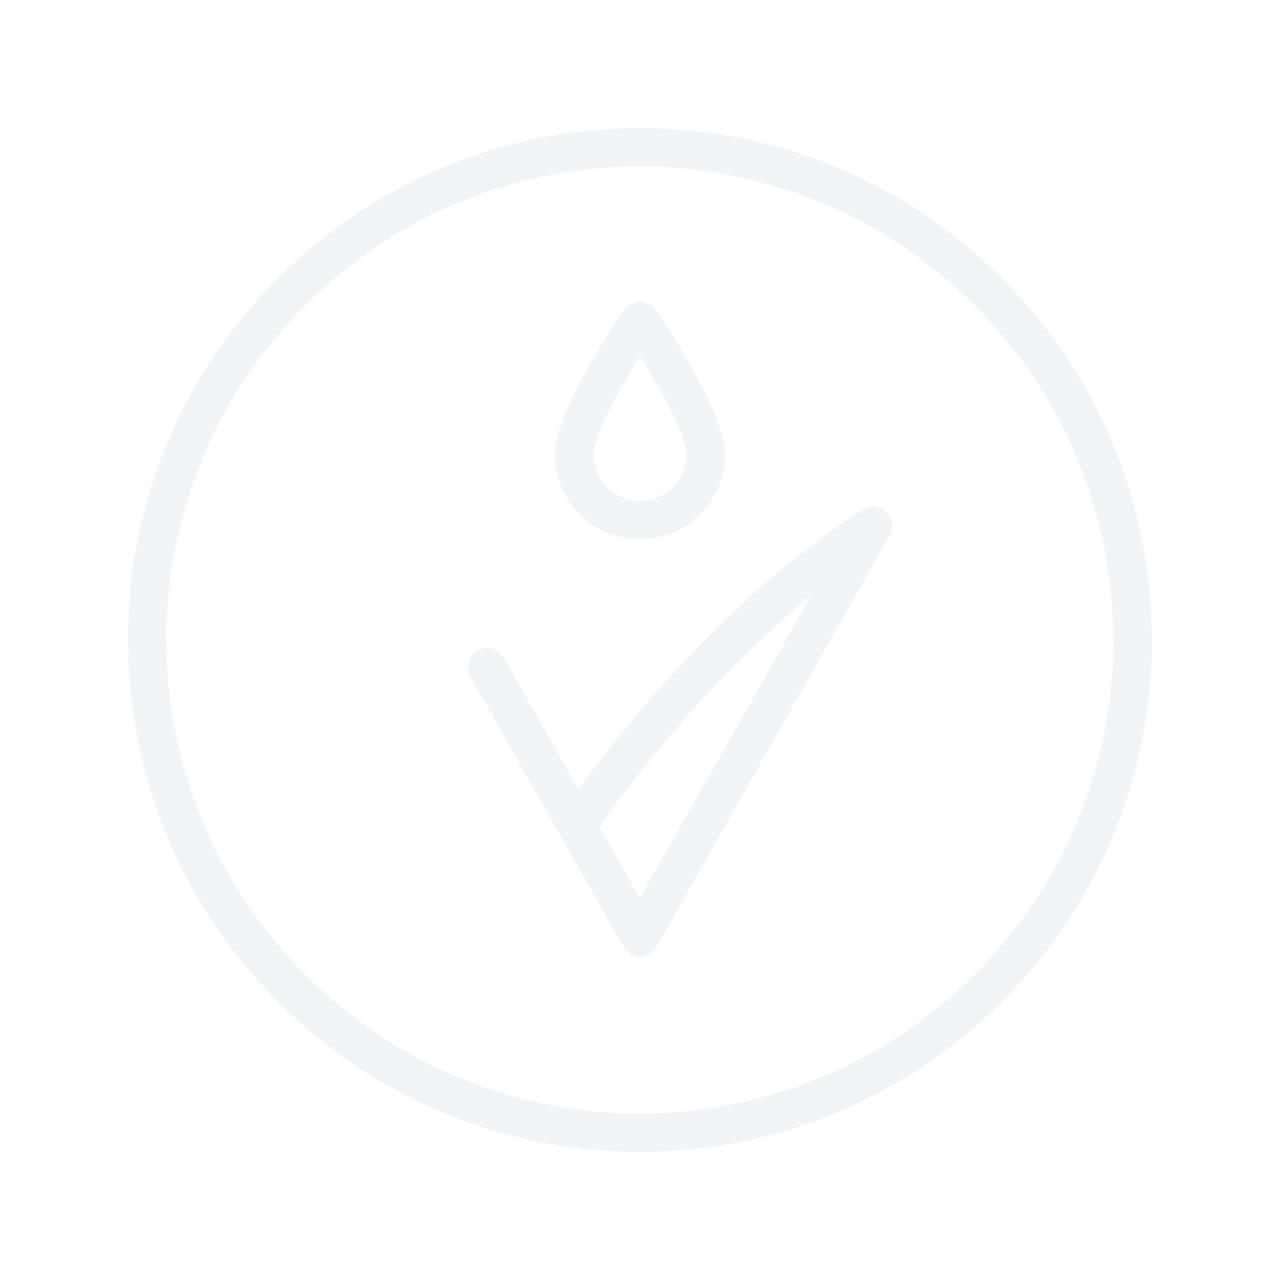 Calvin Klein Euphoria Men EDT 30ml